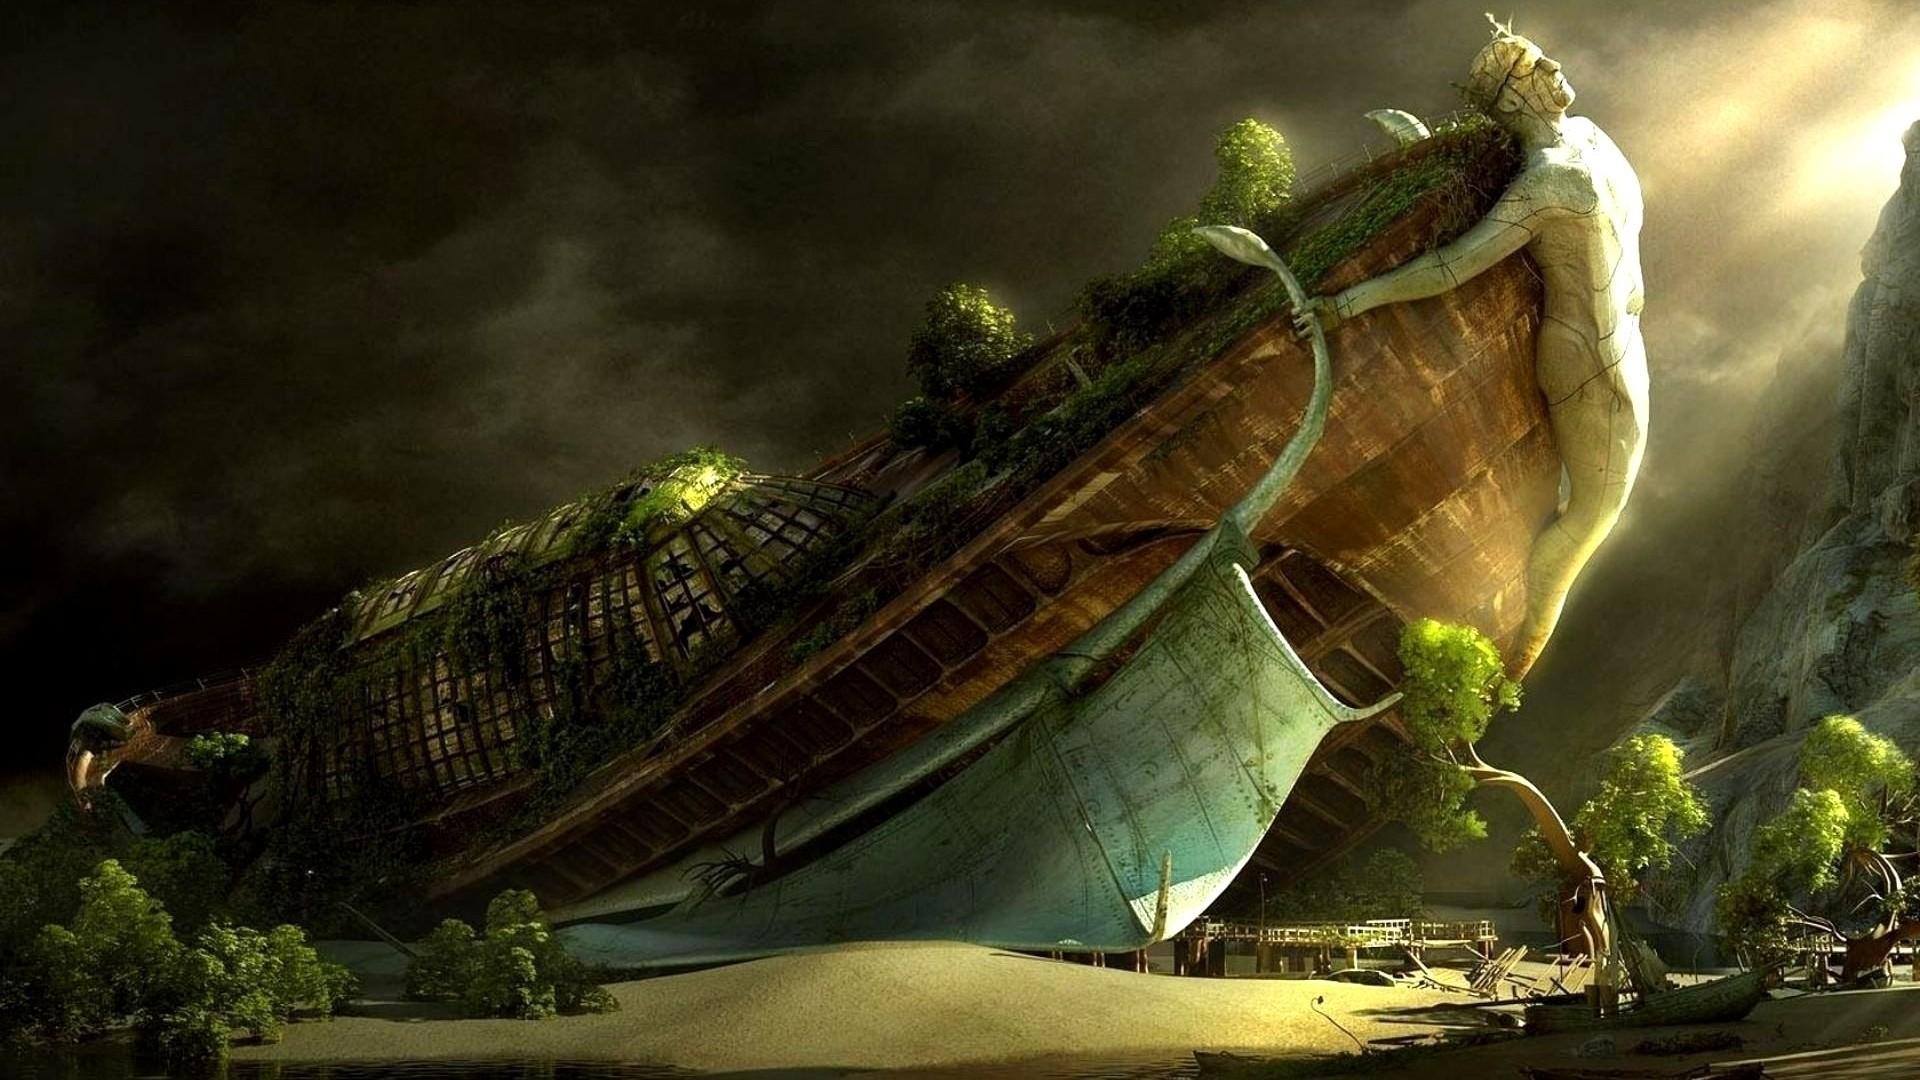 Noahs Titanic Ark Wallpaper